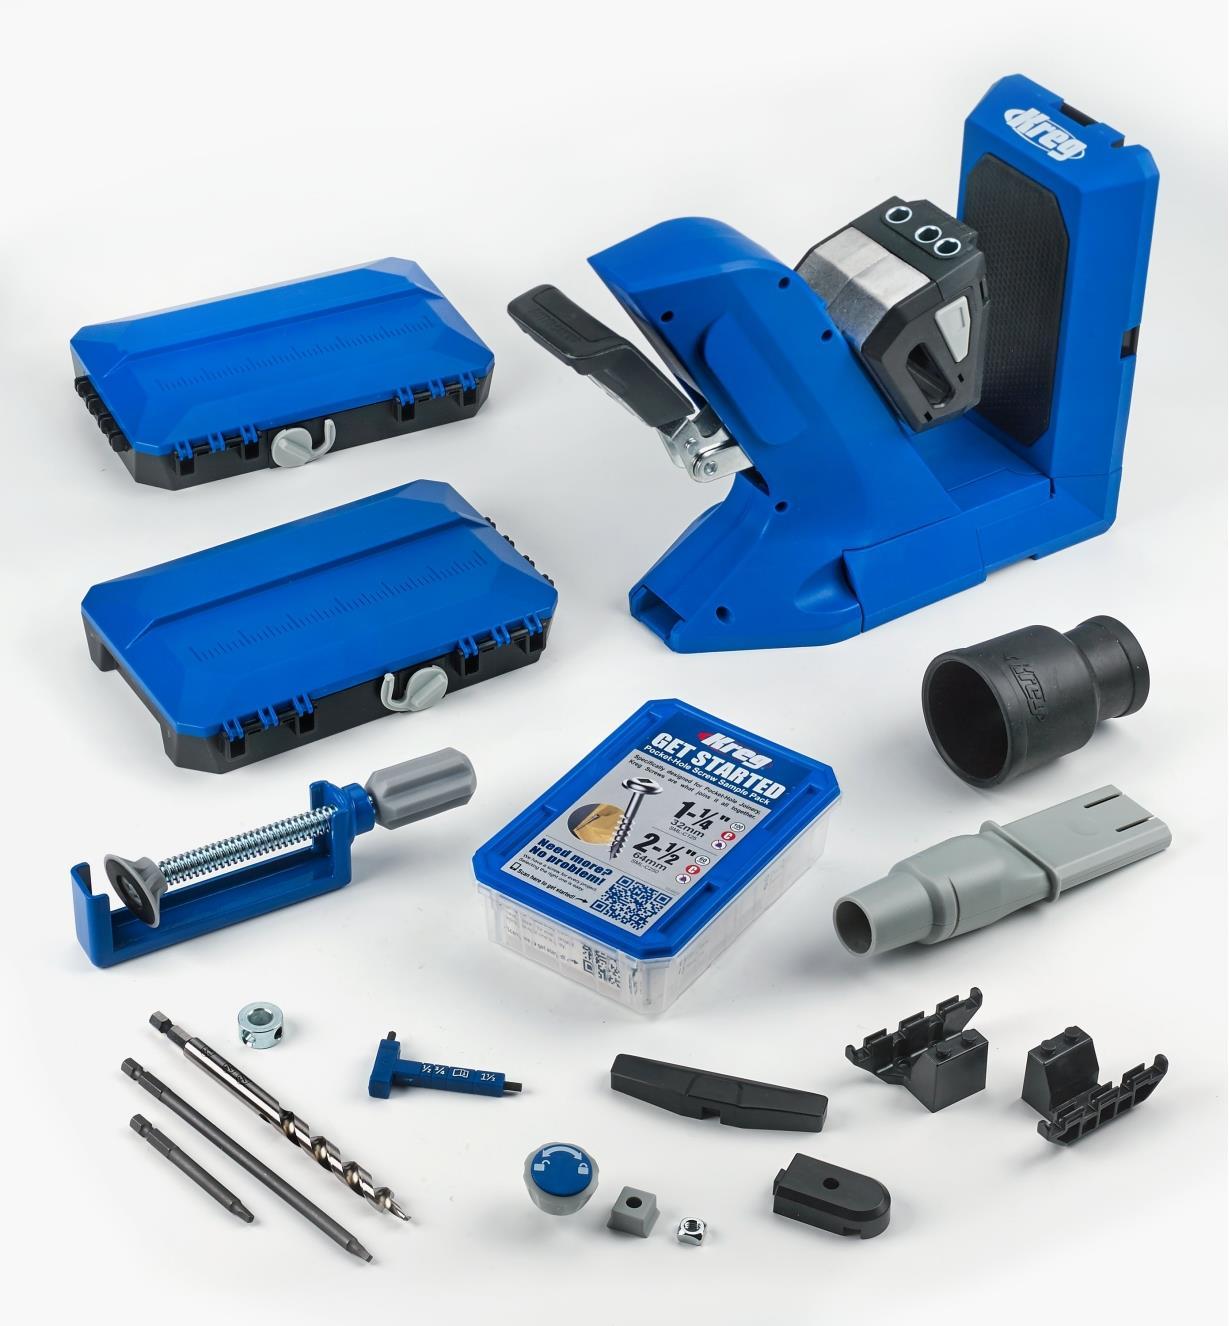 25K6185 - Kreg 720 Pro Pocket-Hole Jig